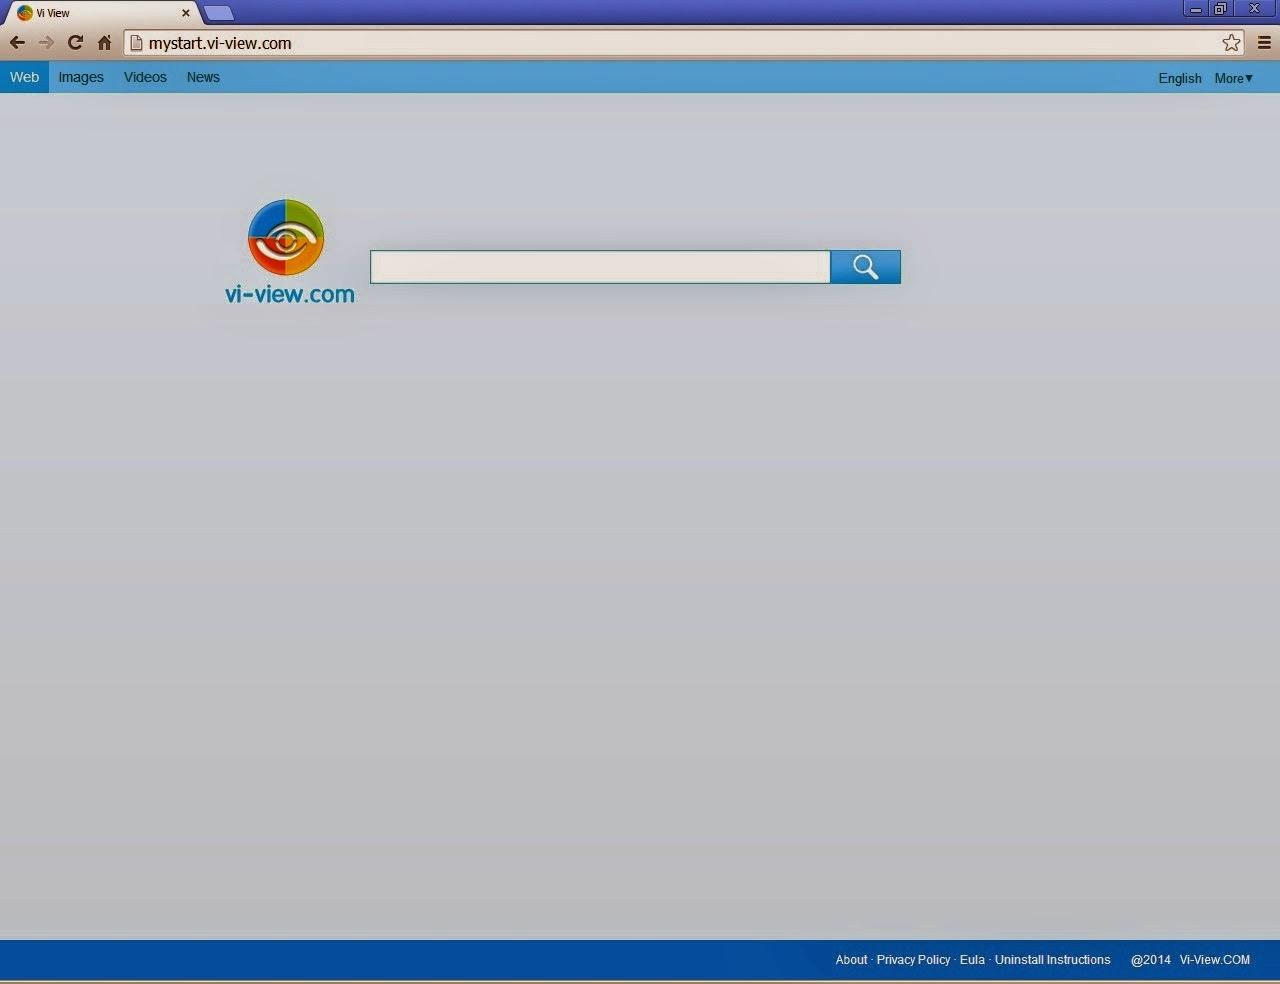 Eliminar Mystart.vi-view.com Secuestrador de Navegadores